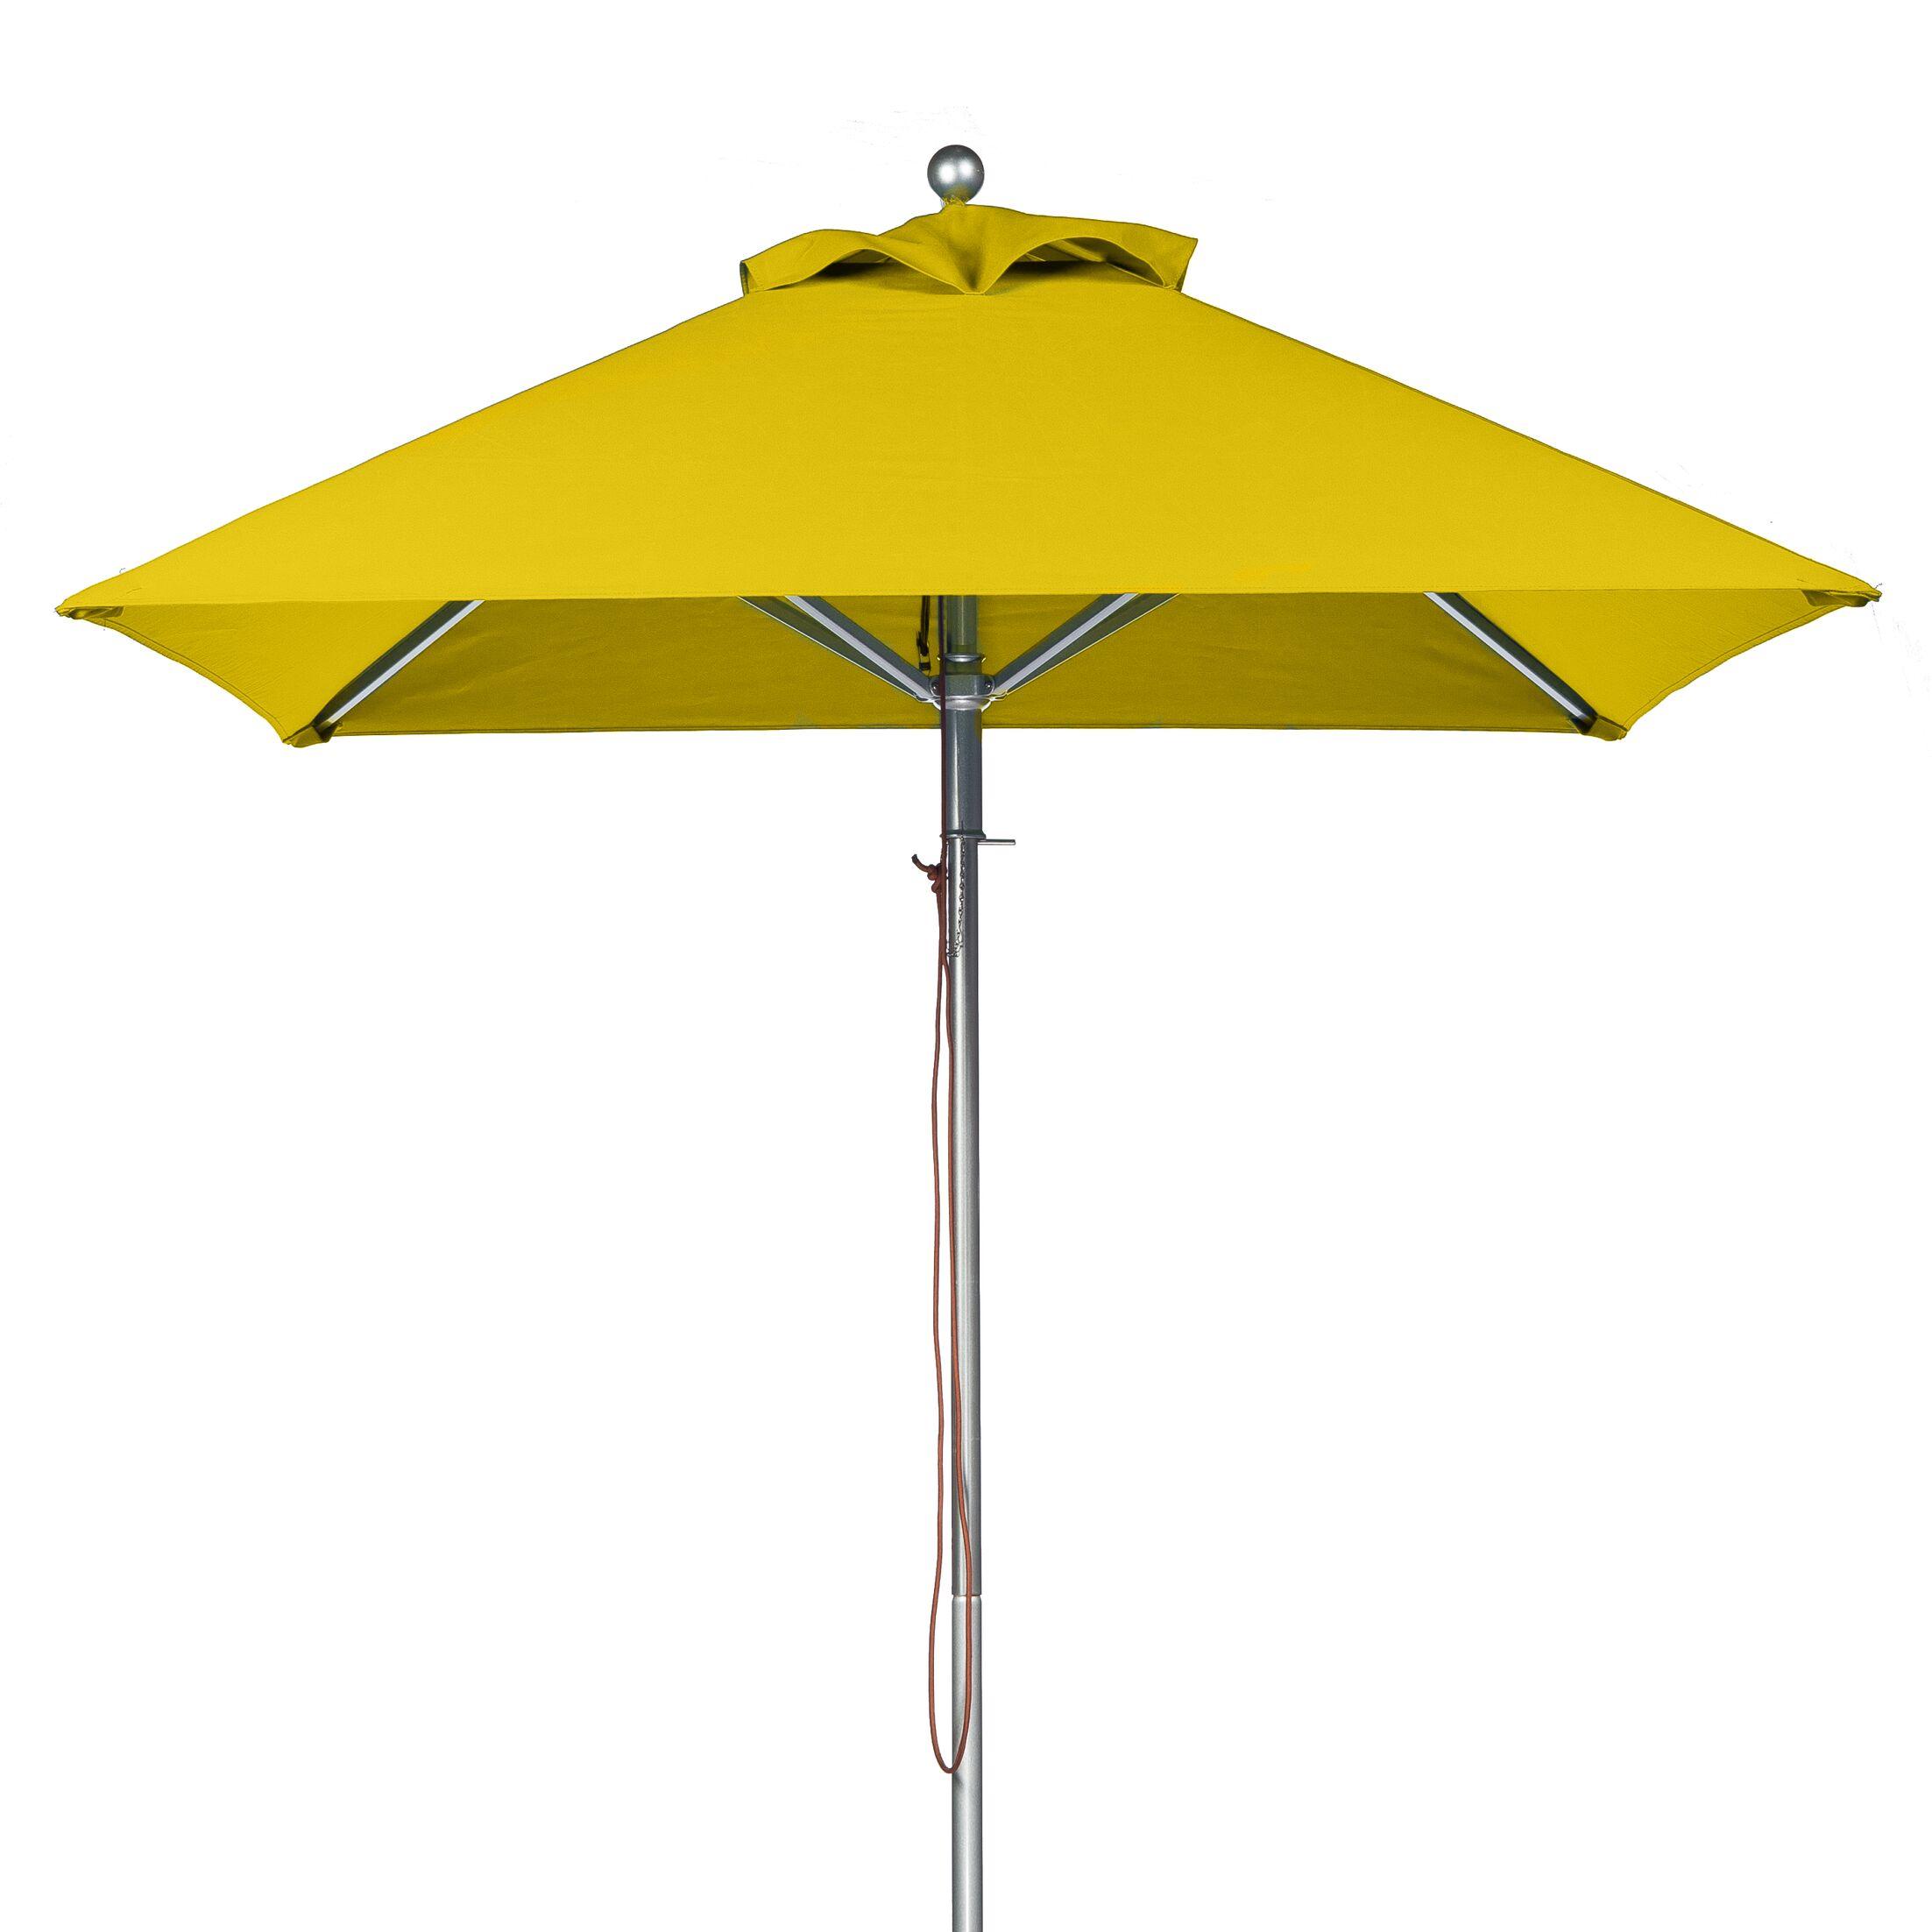 6.5' Square Market Umbrella Fabric: Yellow